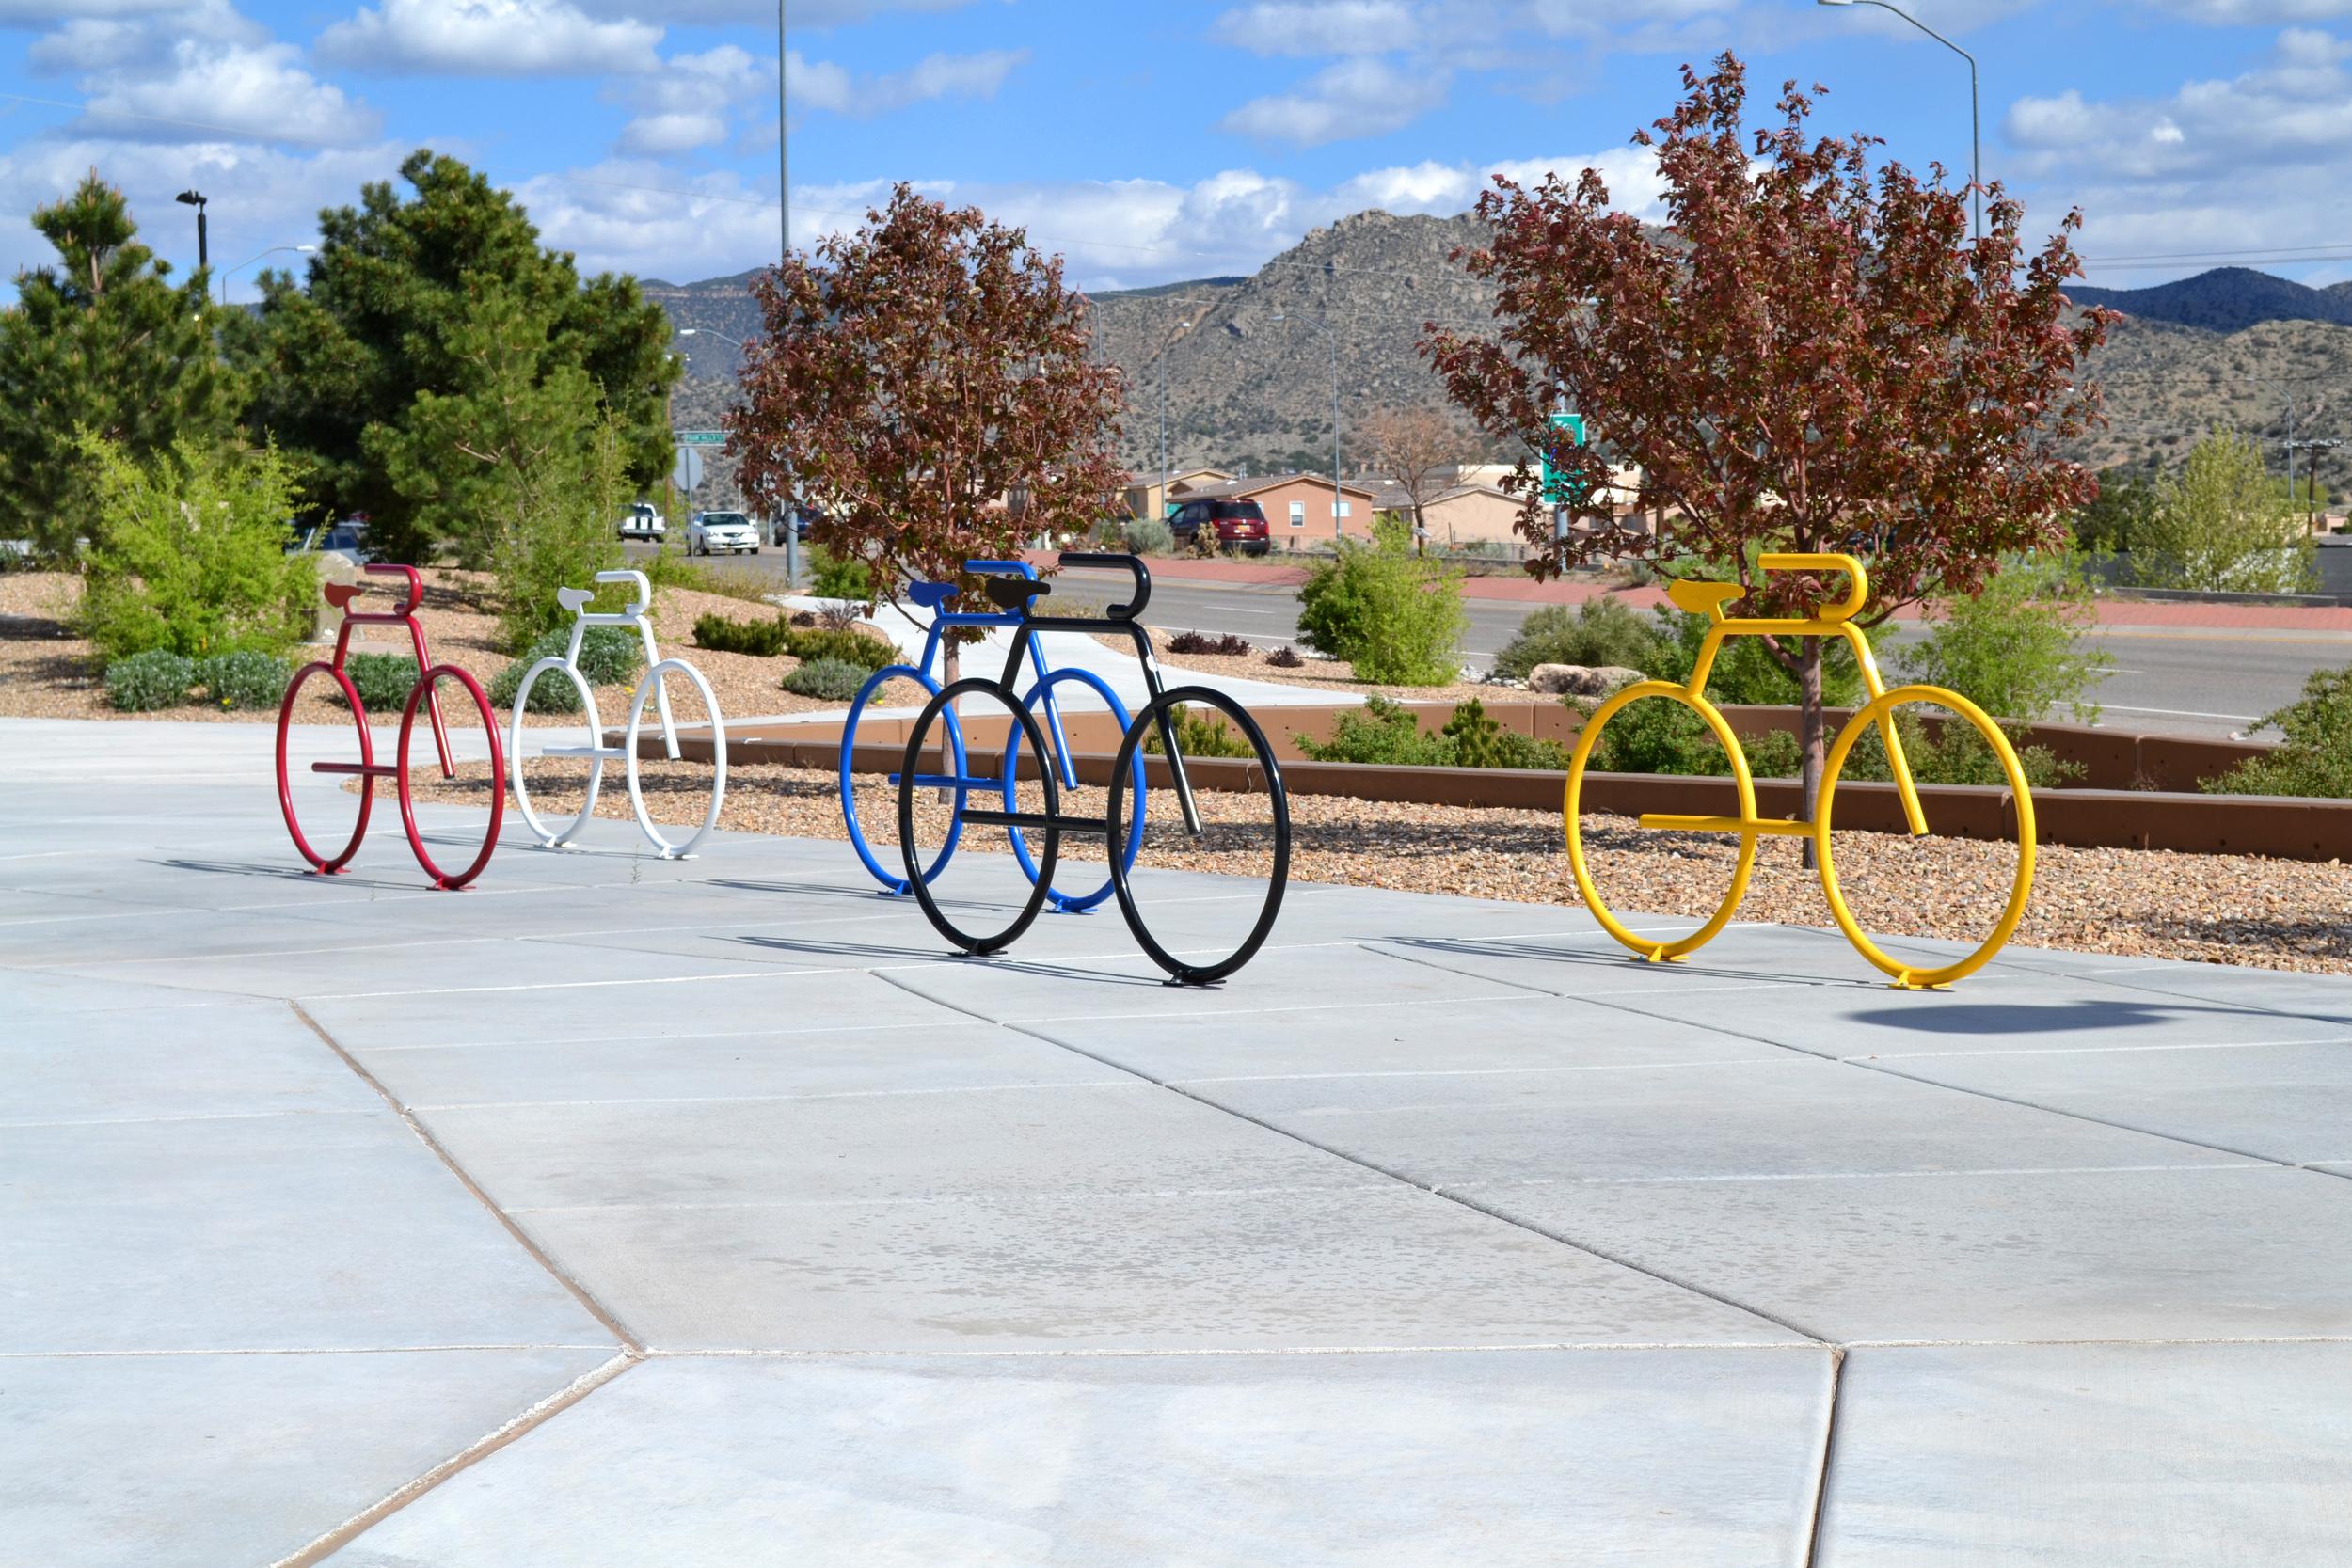 A peloton of bicycle racks